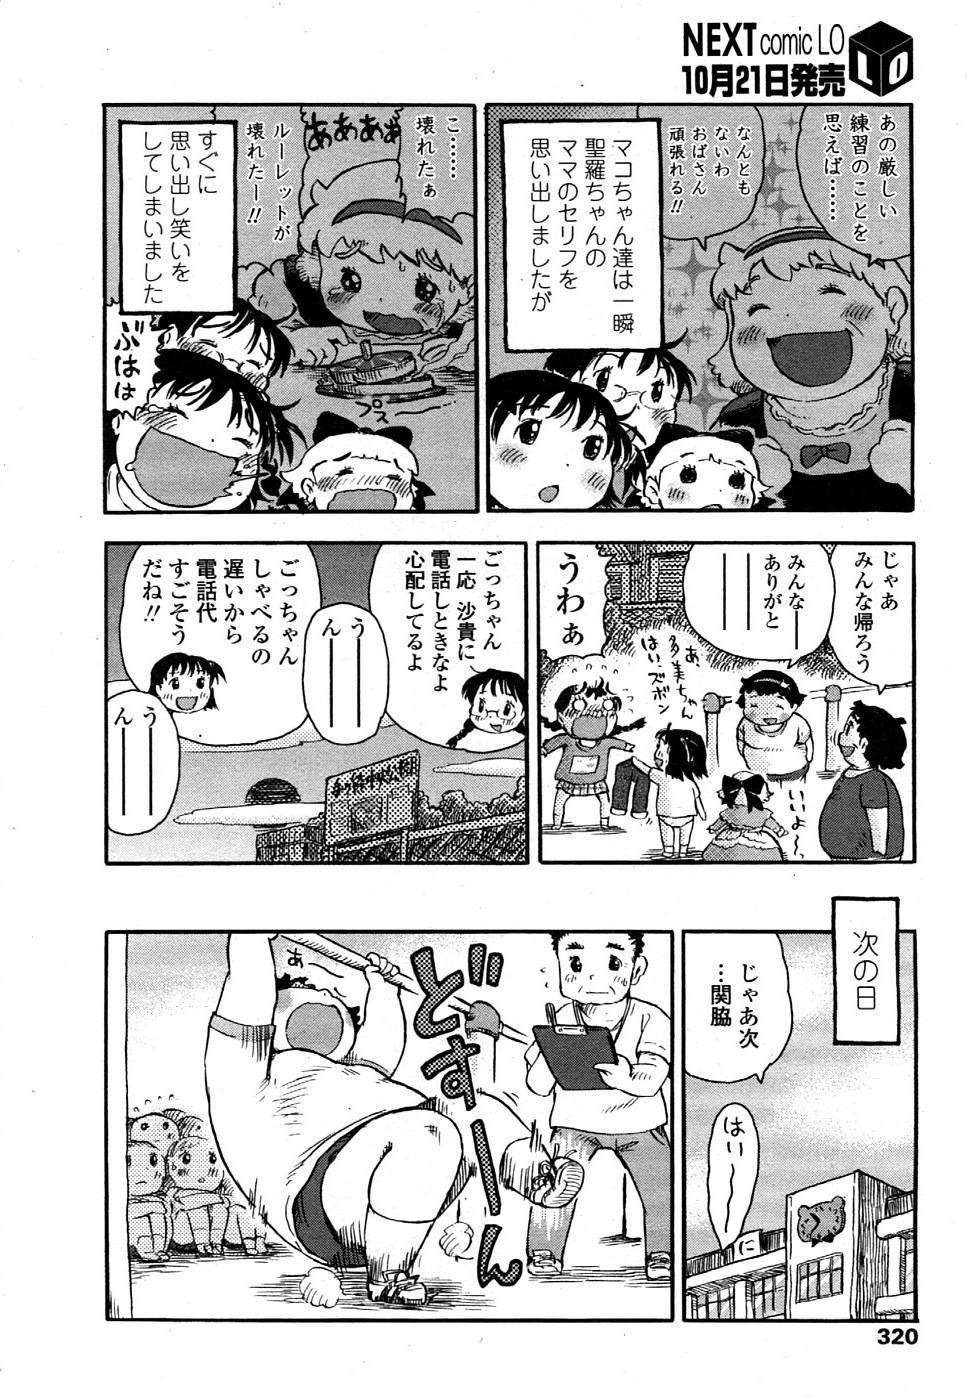 Comic LO 2008-11 Vol. 56 319